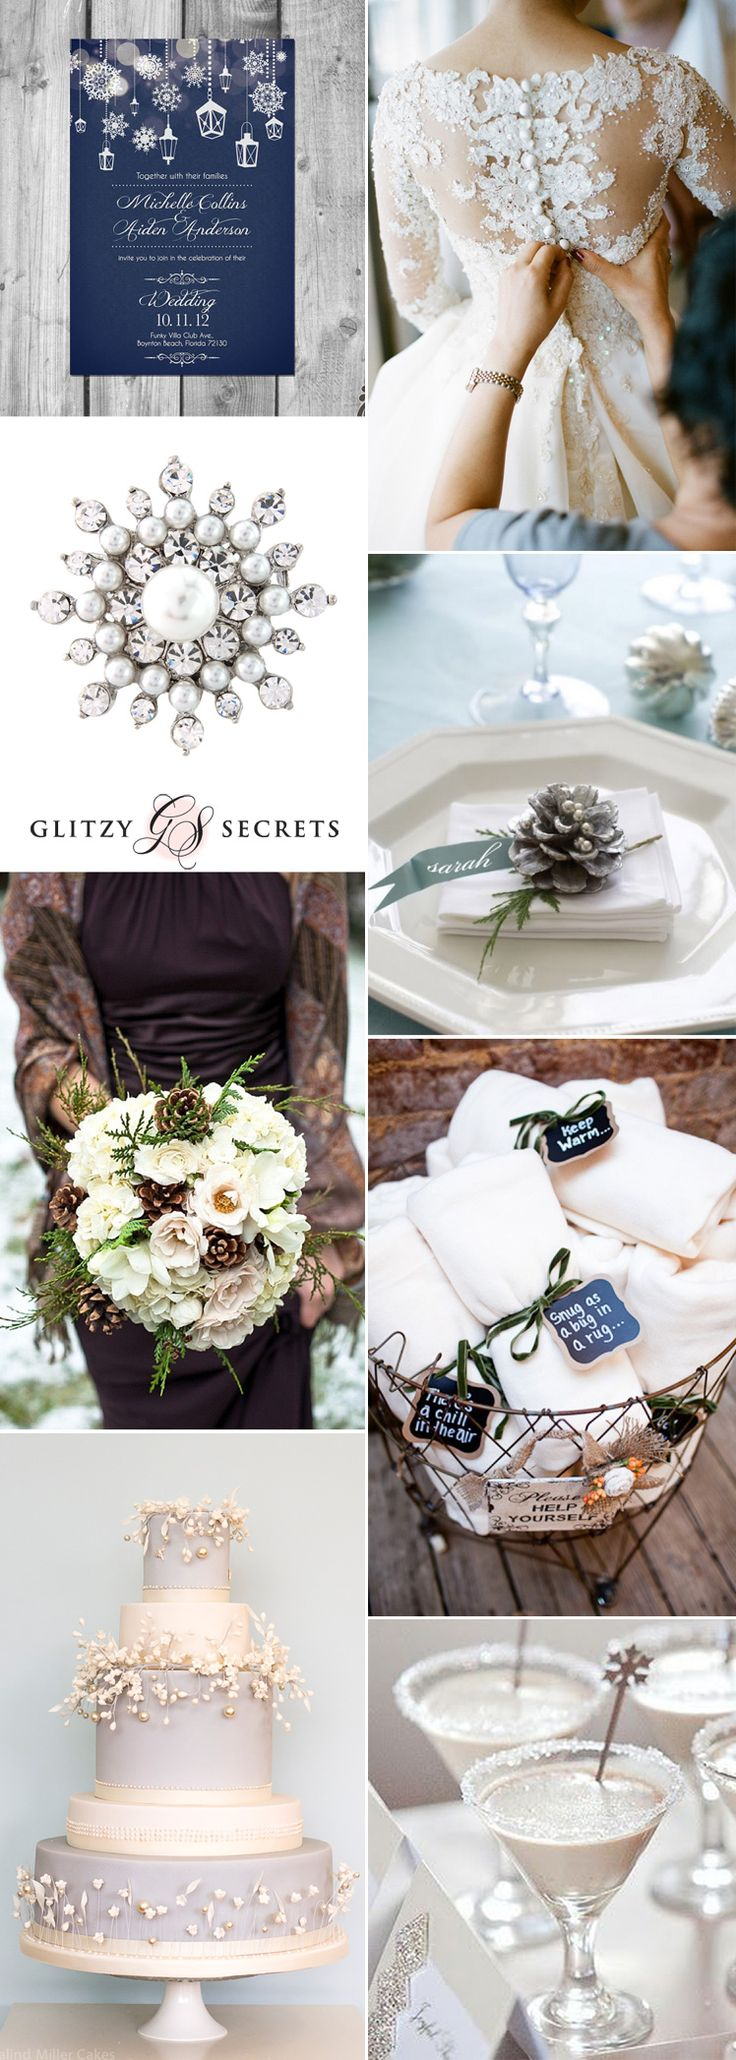 winter wonderland wedding south africa%0A Magical Winter Wedding Ideas